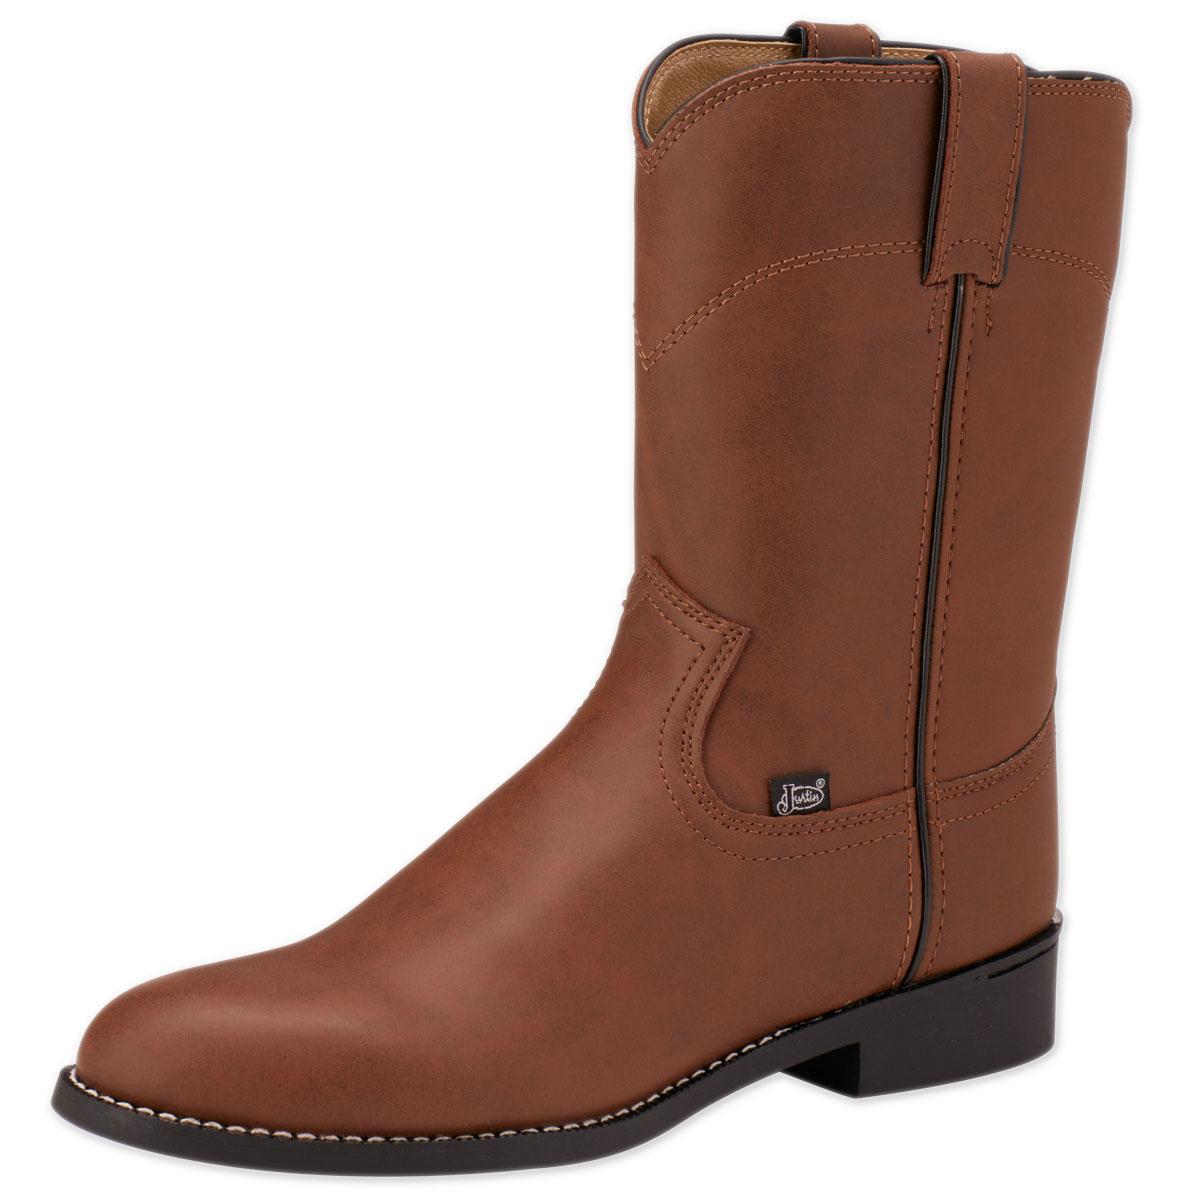 3a3feb7ee6c Justin Men's Farm and Ranch Roper Boot